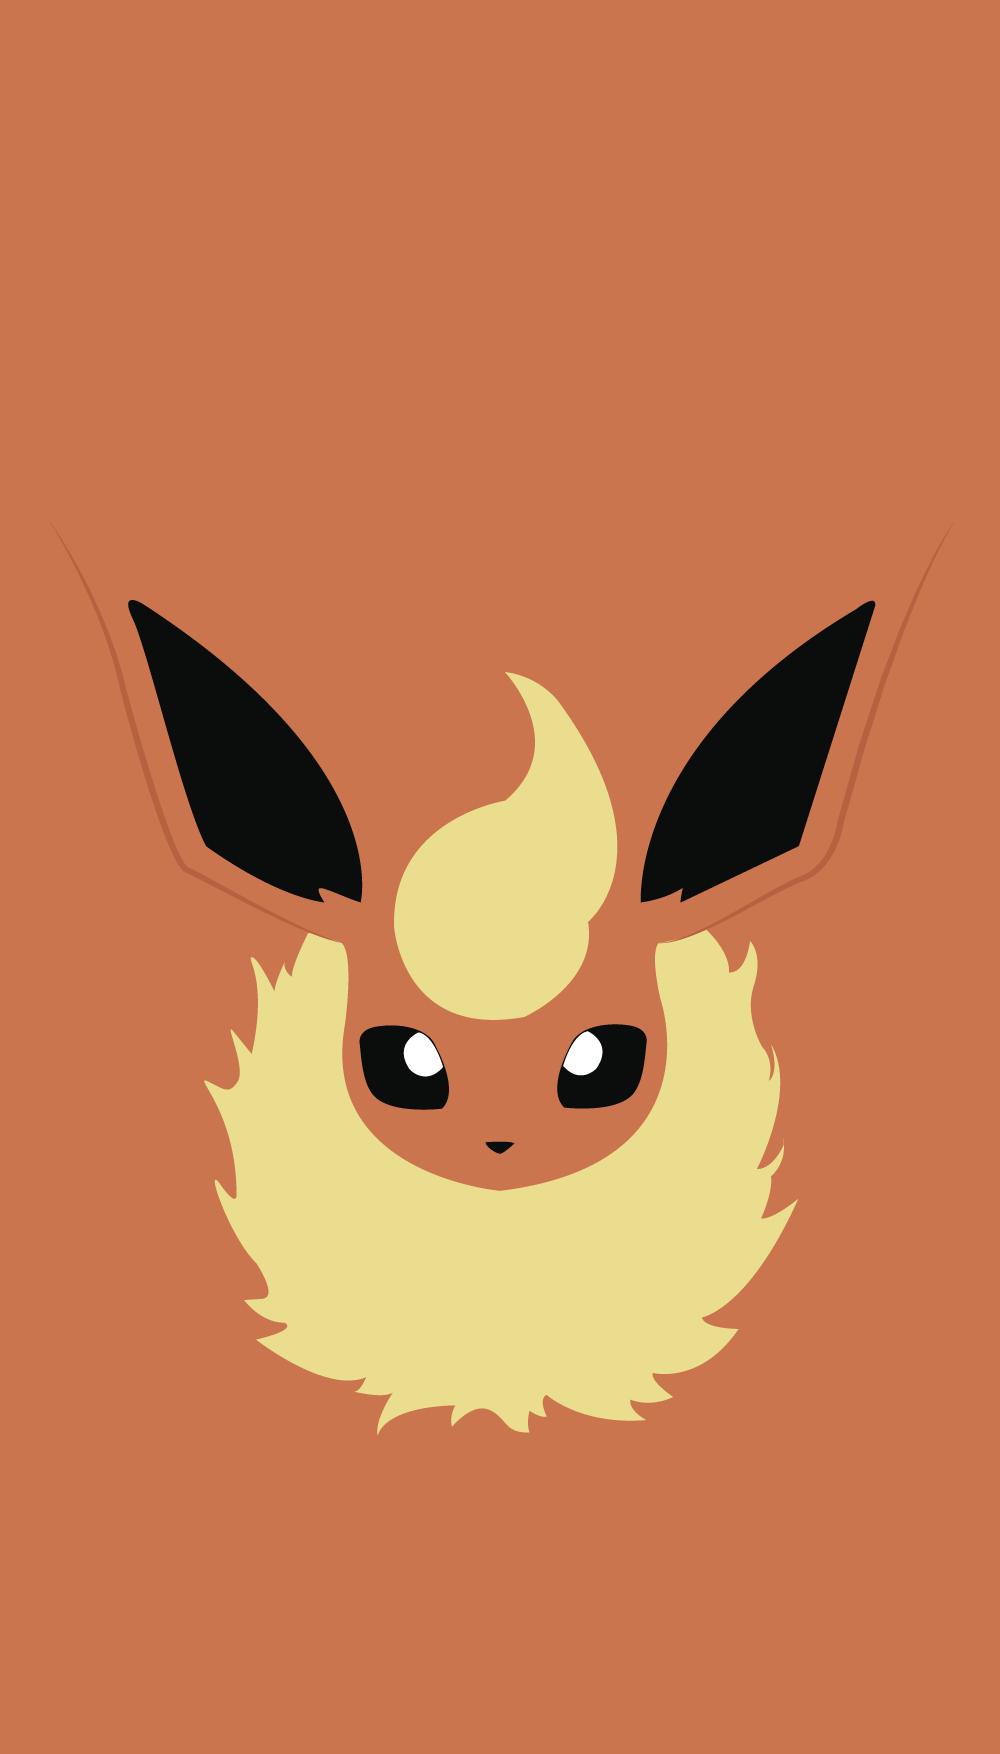 pokemon wallpaper flareon pokemon pinterest pok233mon